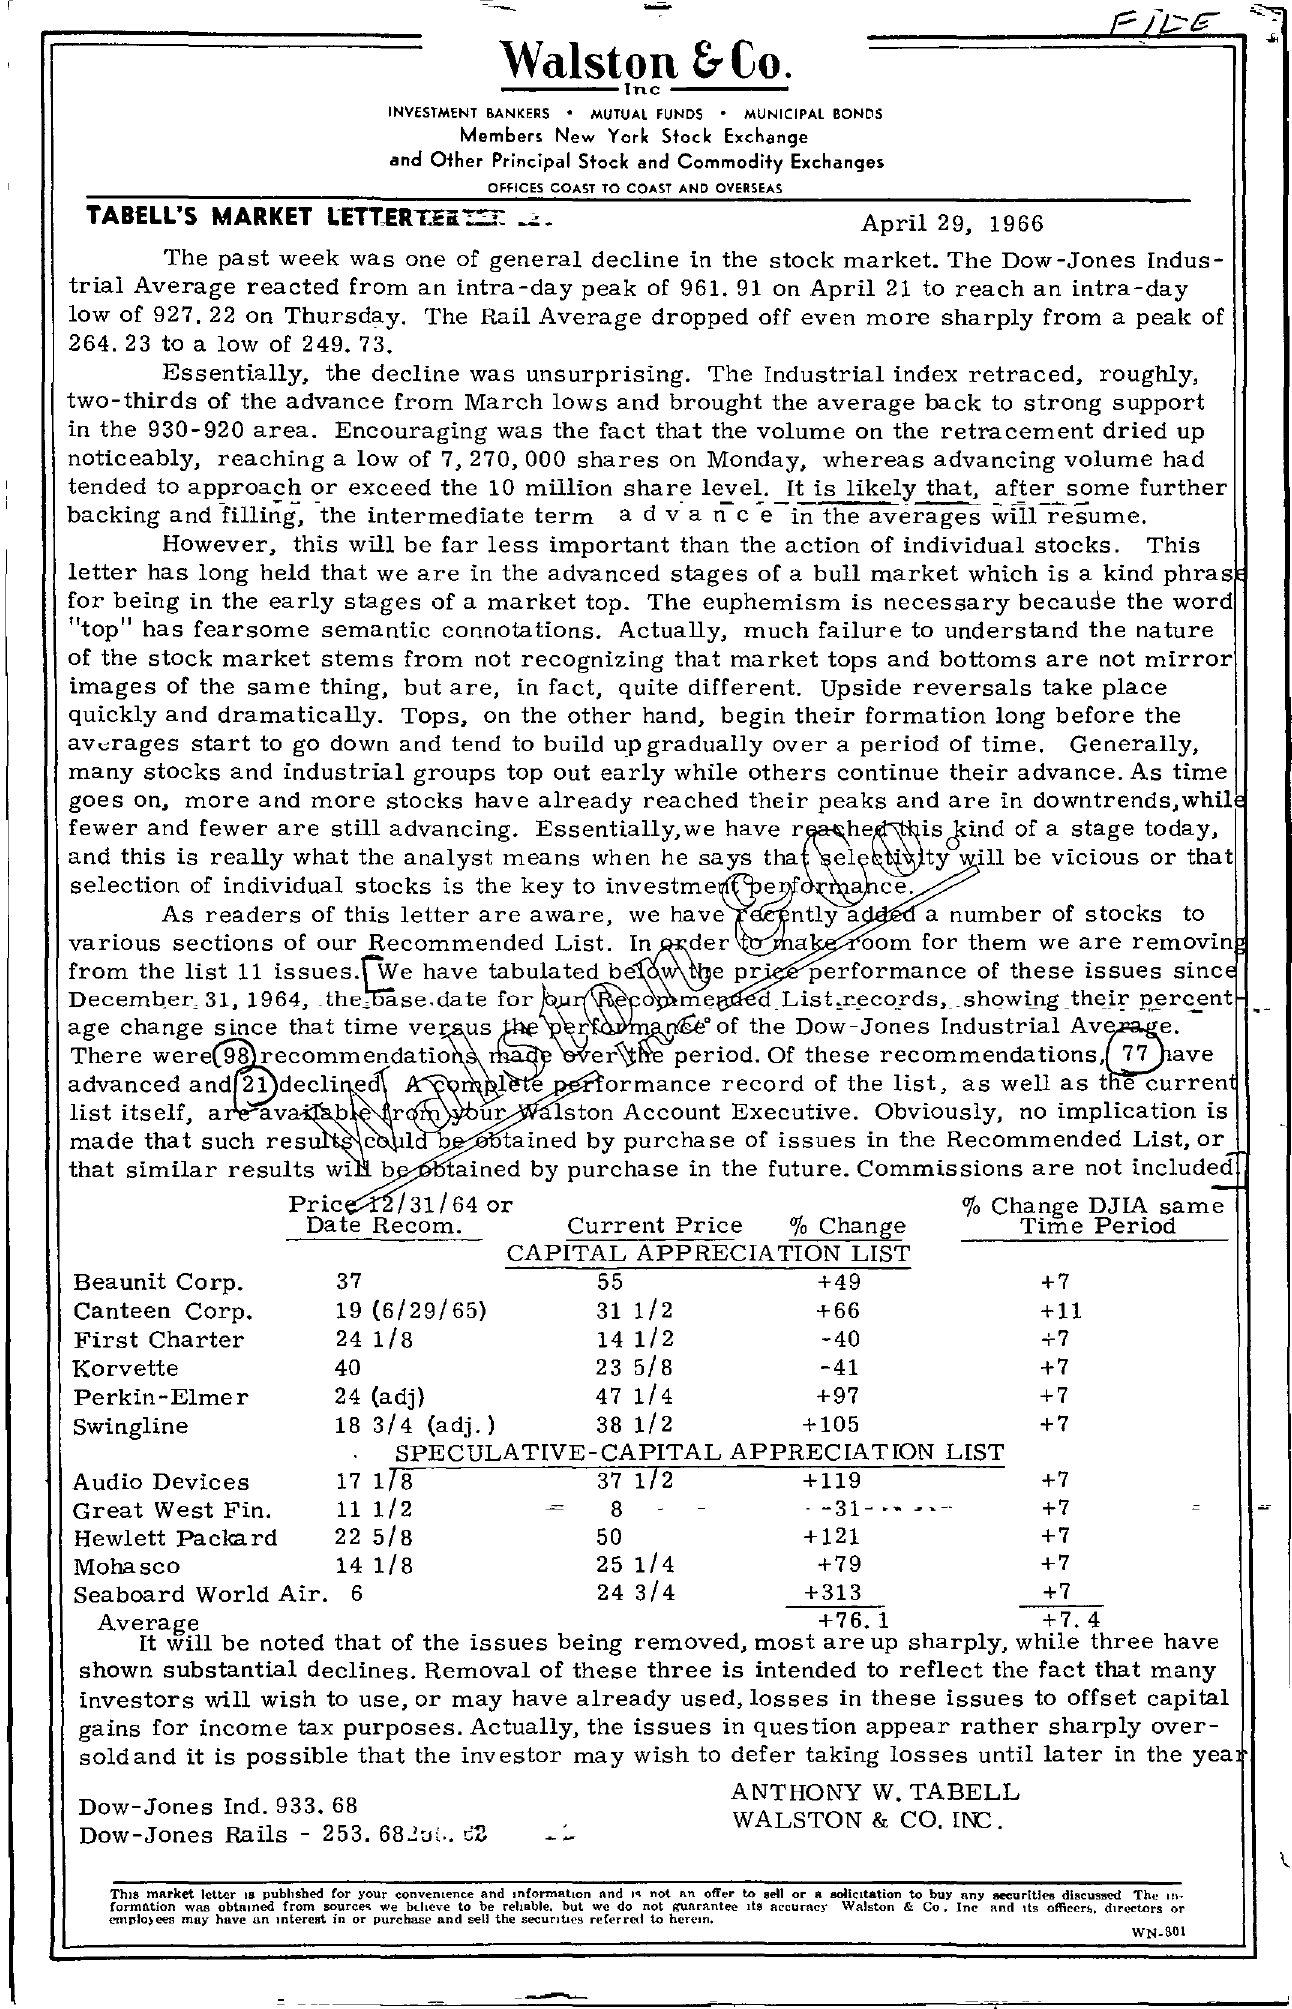 Tabell's Market Letter - April 29, 1966